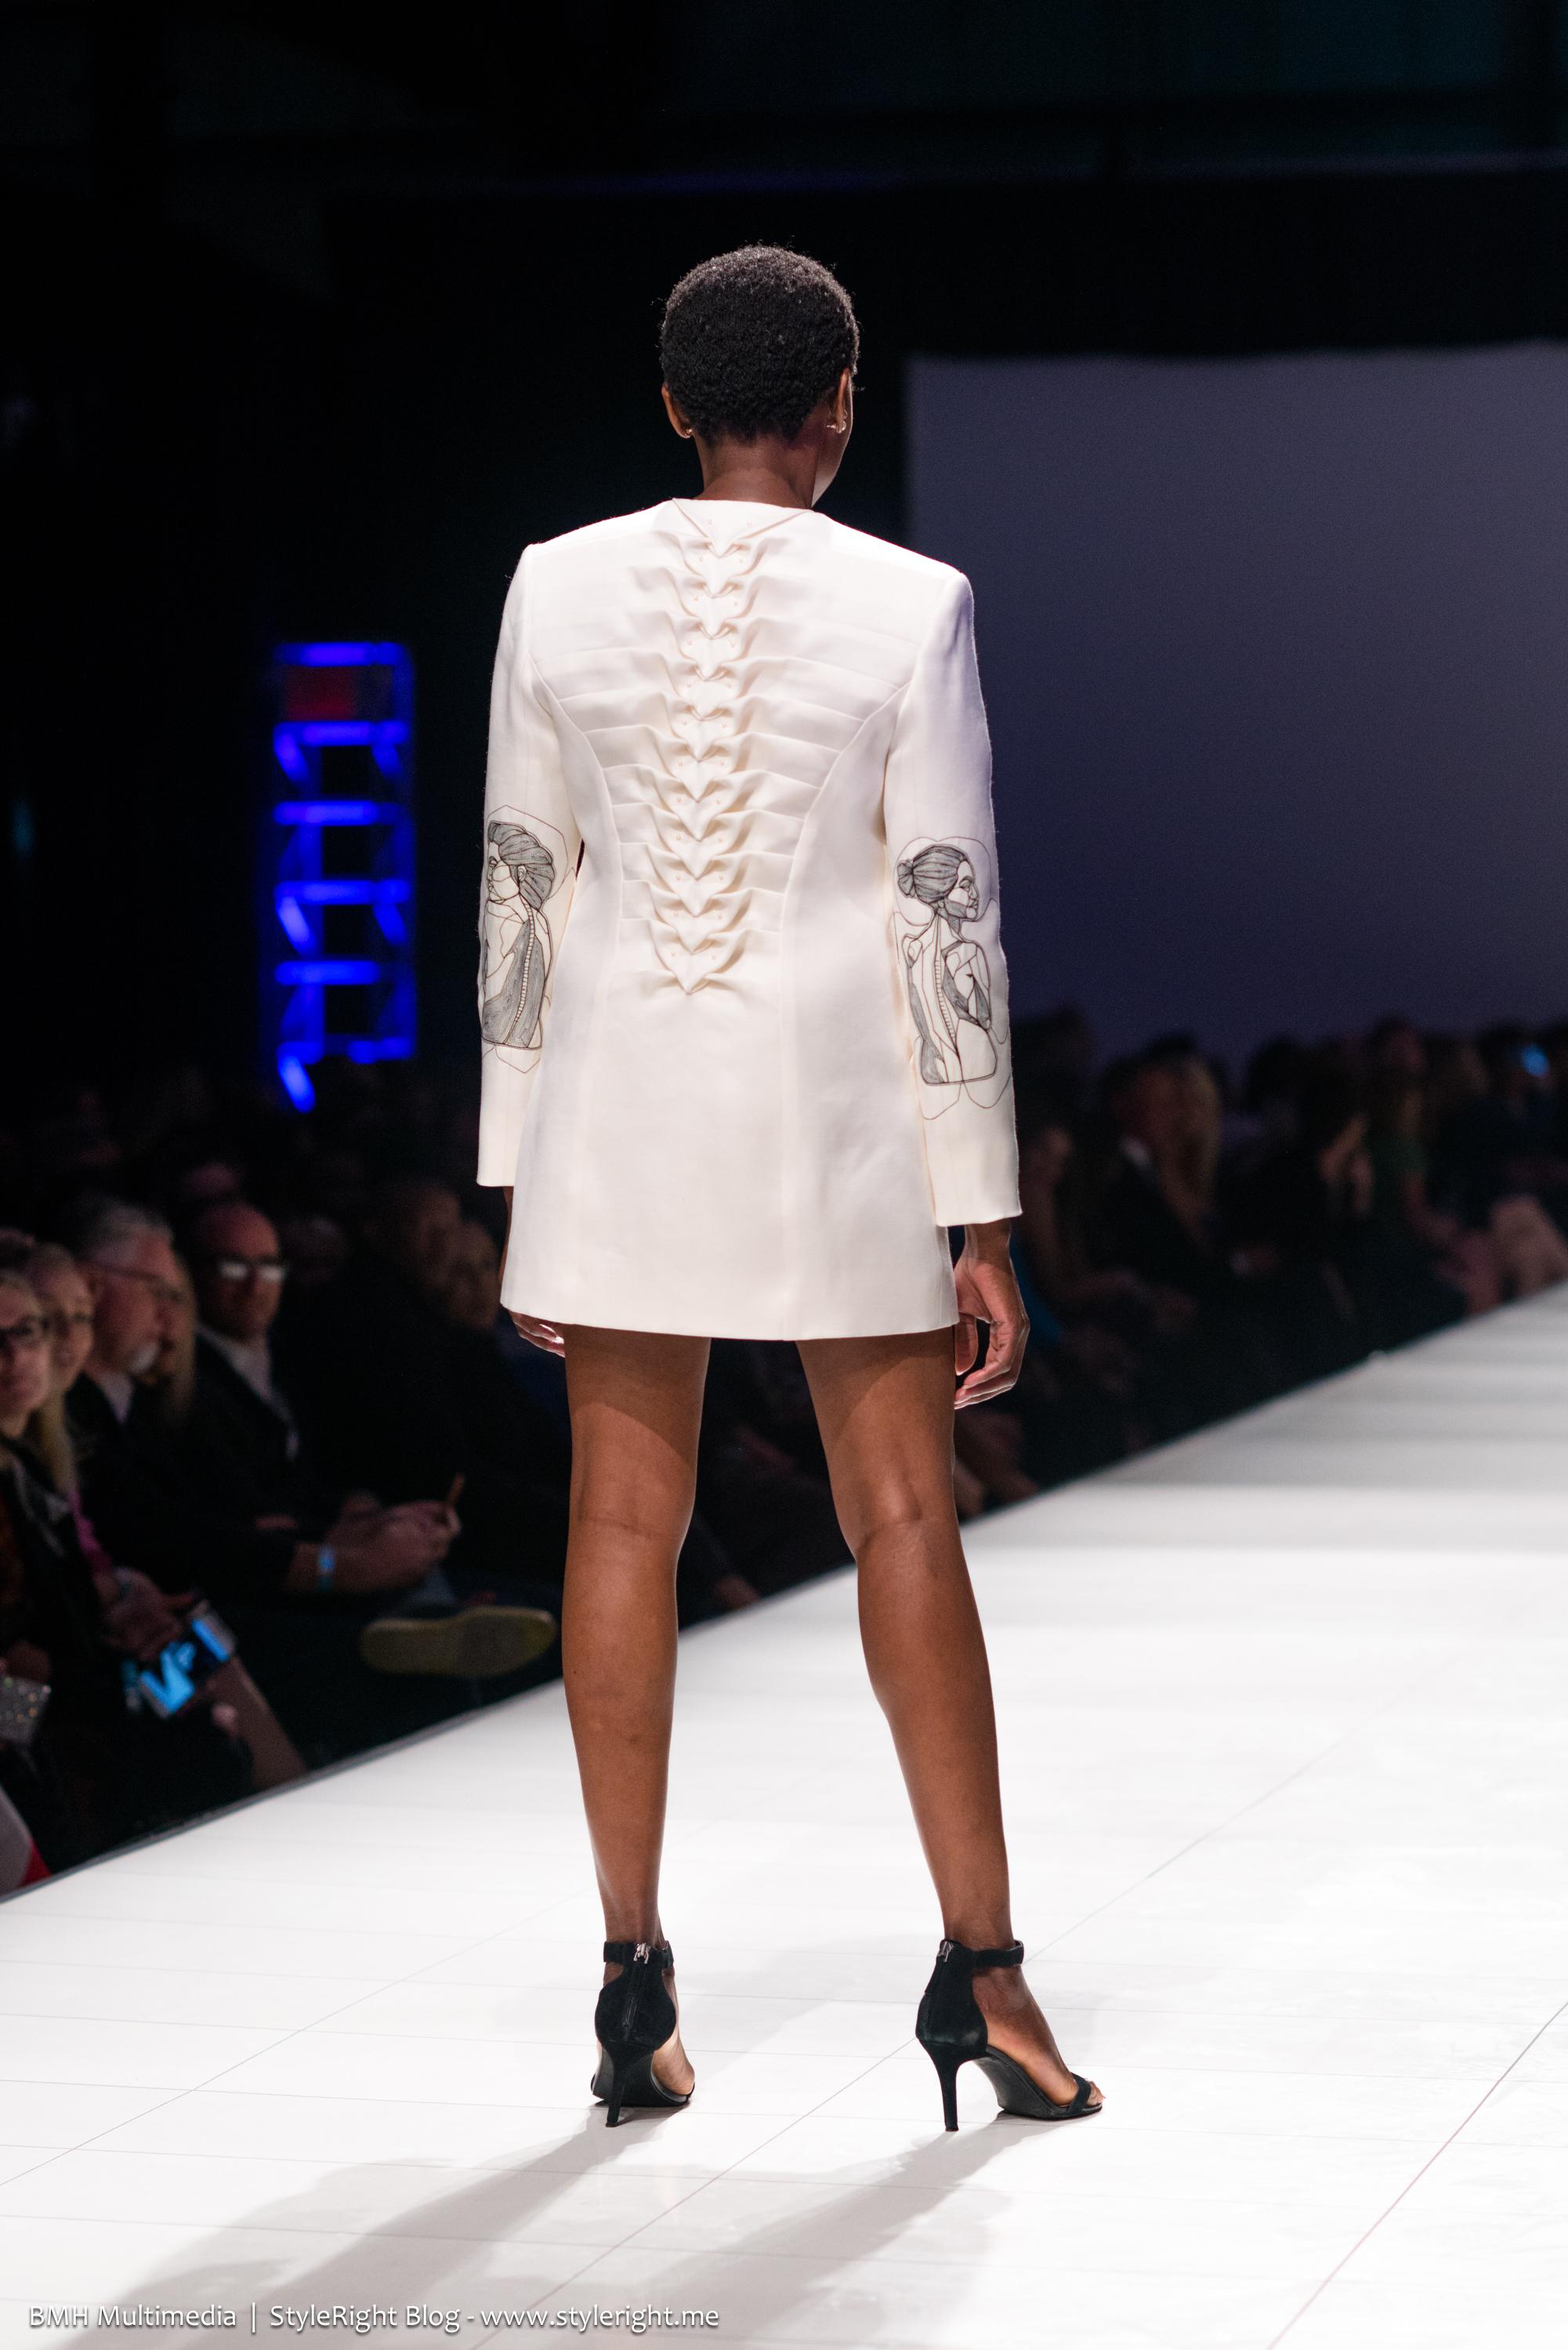 2017-fashionxt-night-2-6982.jpg